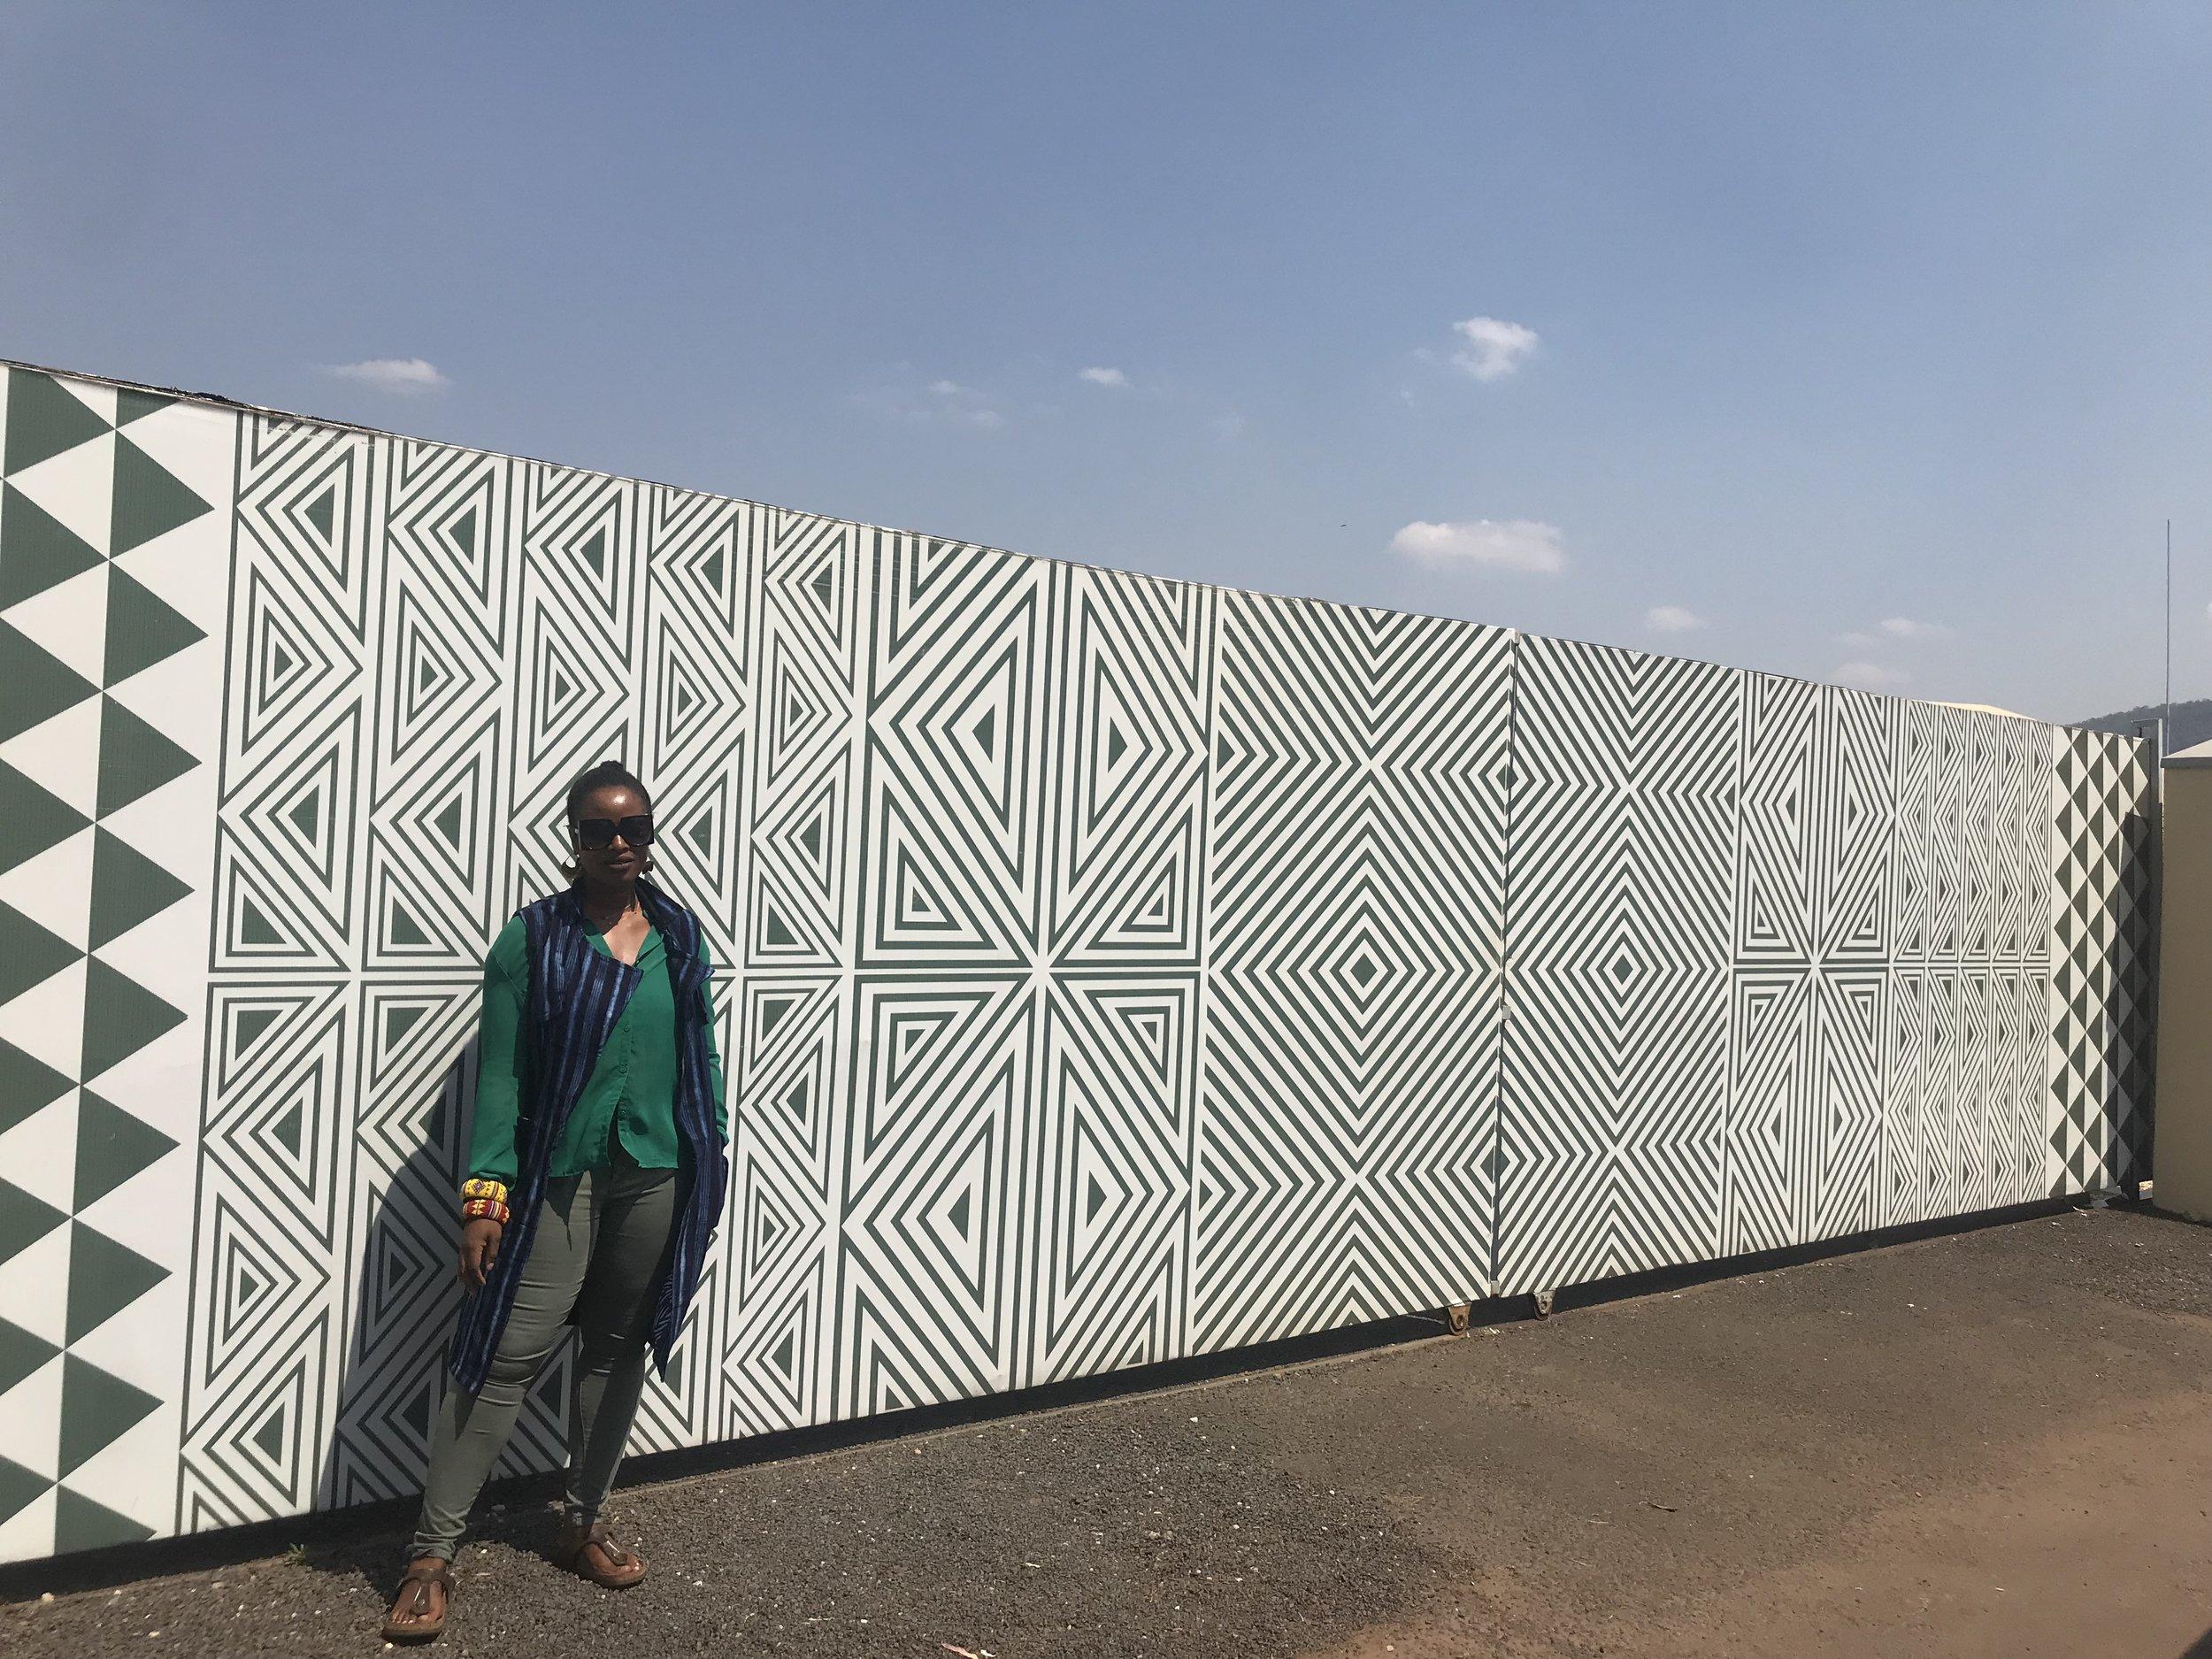 IMG_6056VickieRemoe-travel-kigali-rwanda-review-kwibohora25-hotels-africa.JPG